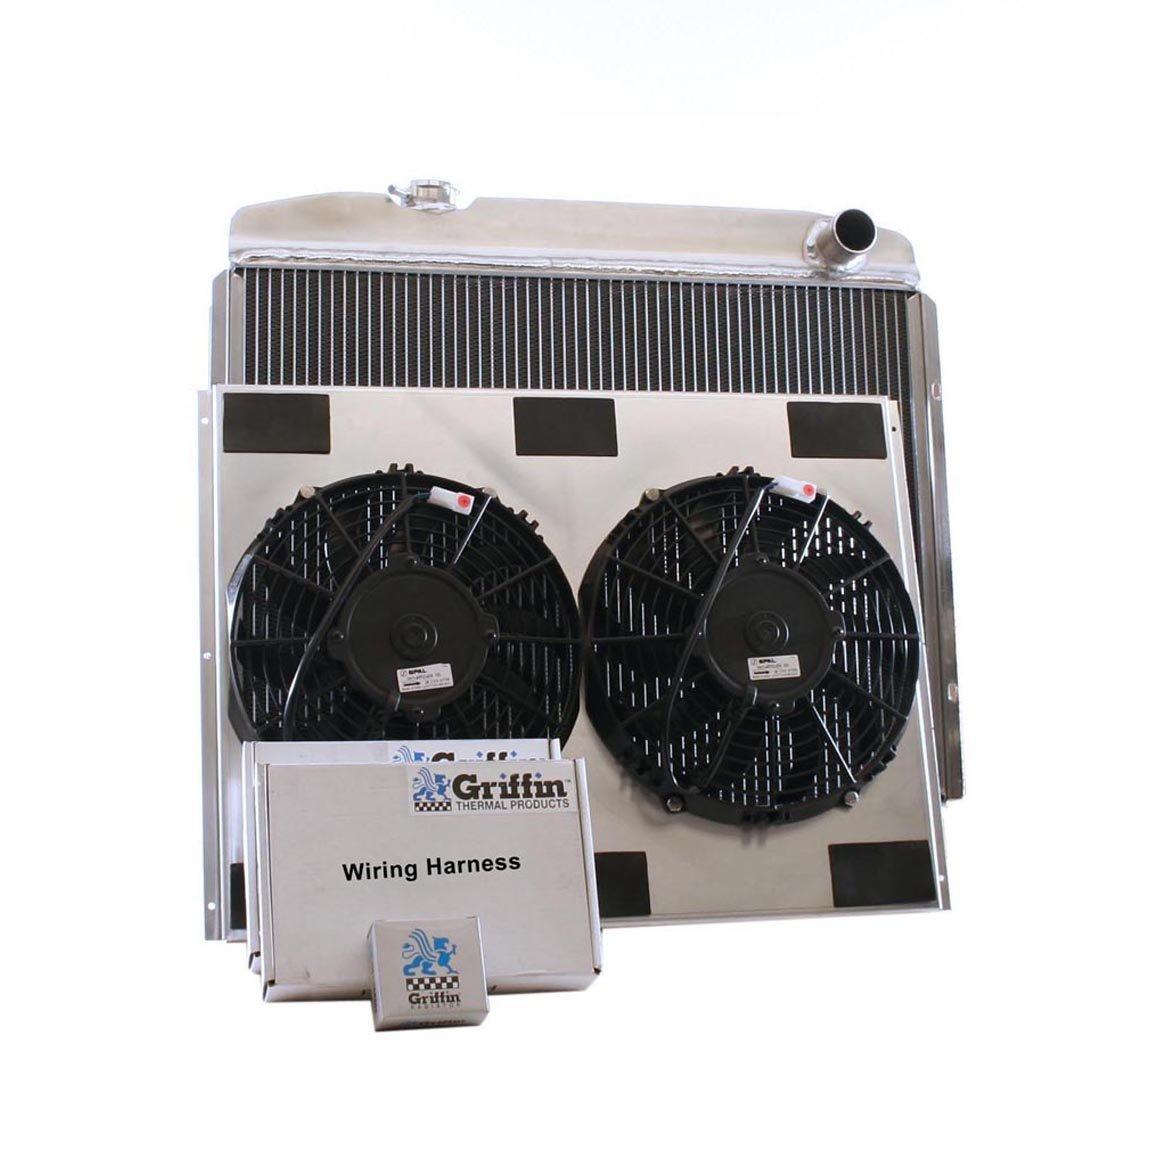 Griffin Radiator CU-70050 ComboUnit Radiator and Electric Fan Kit